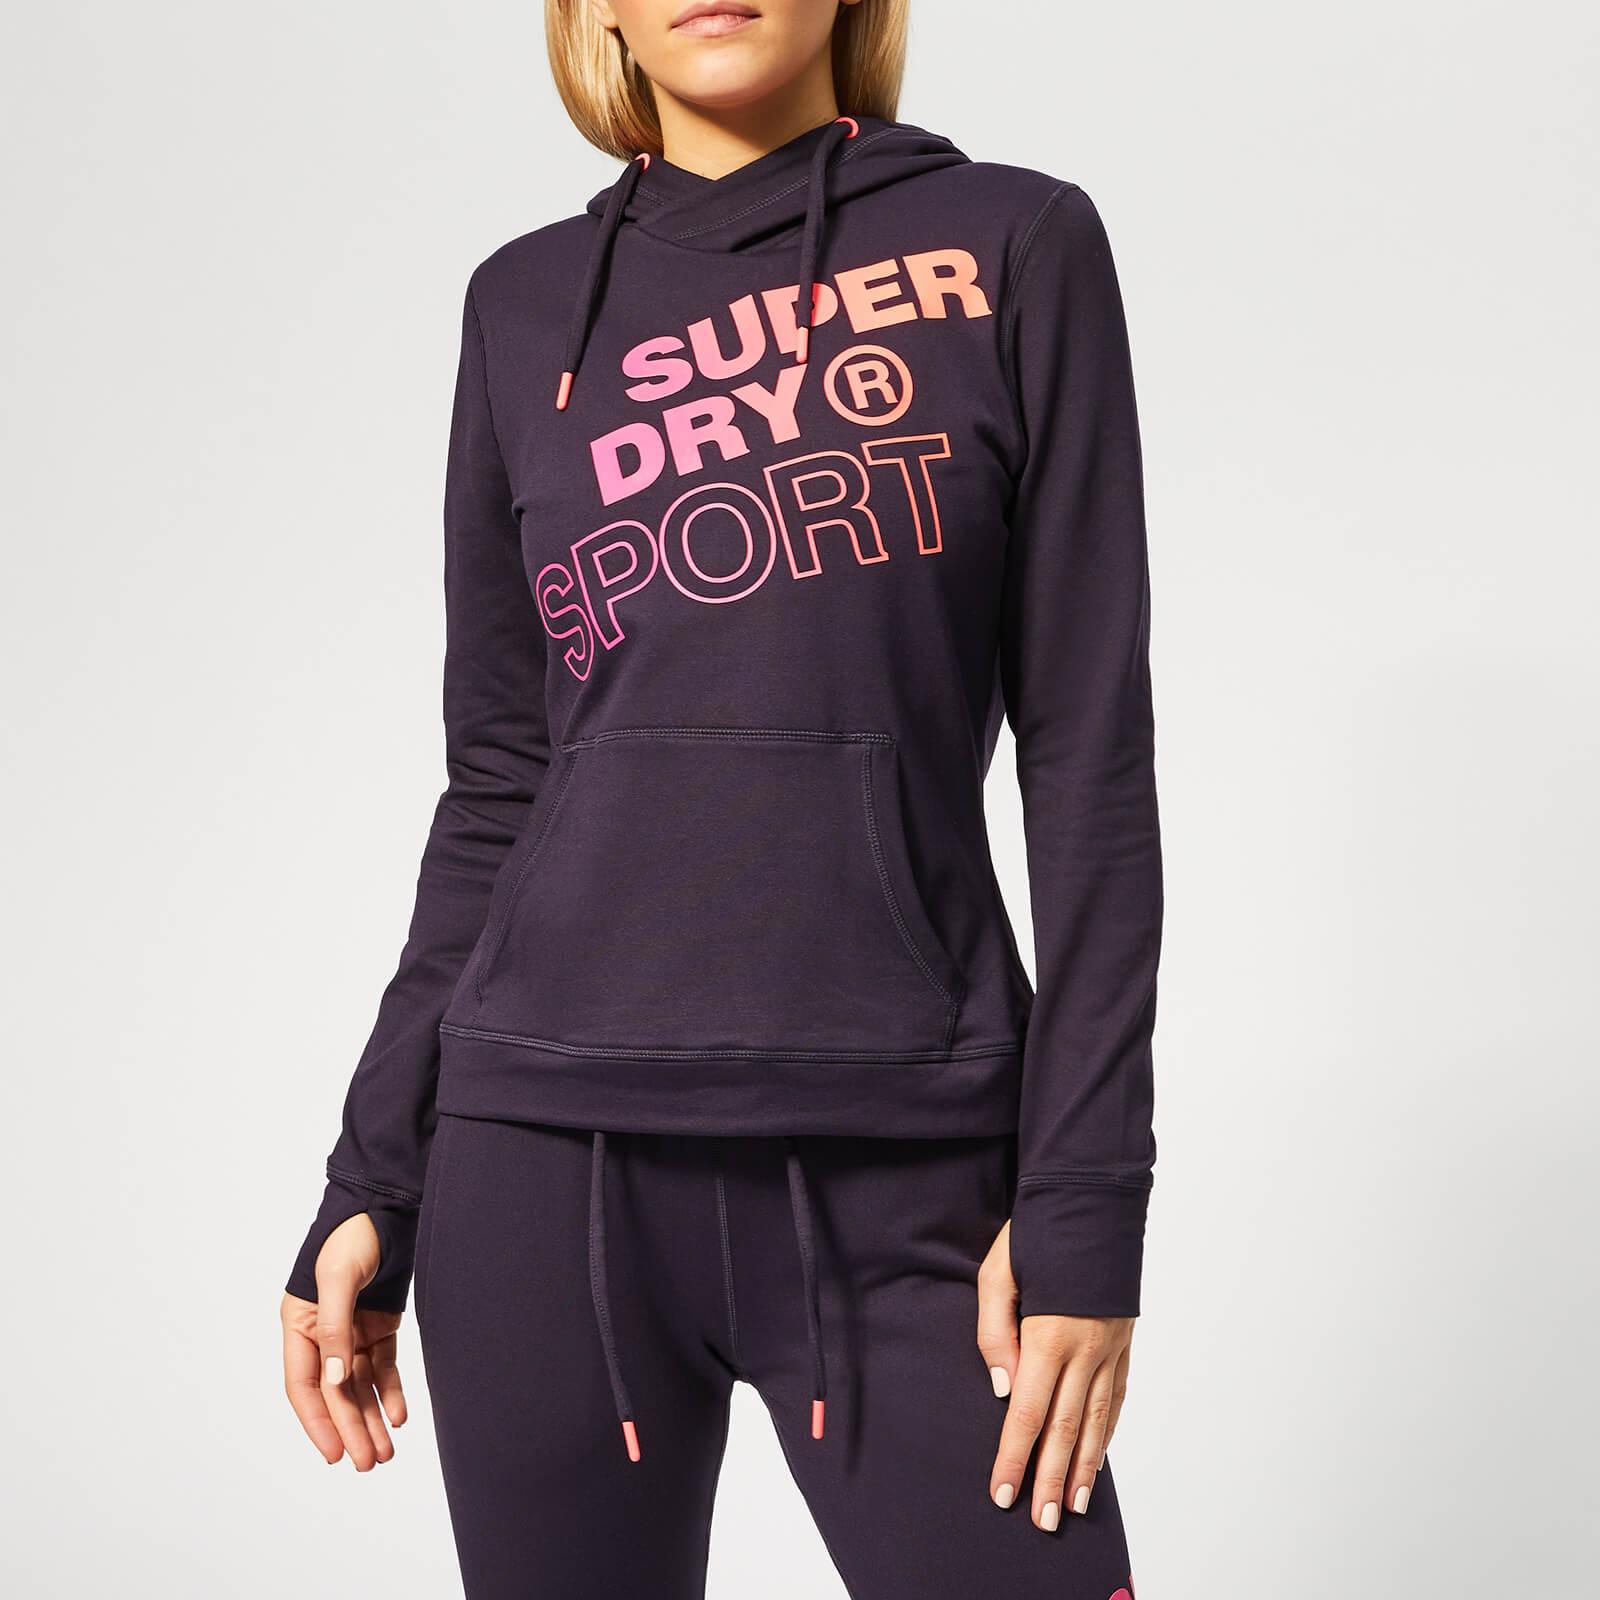 Superdry Sport Women's Core Graphic Hoody - Midnight Purple - UK 12 - Purple